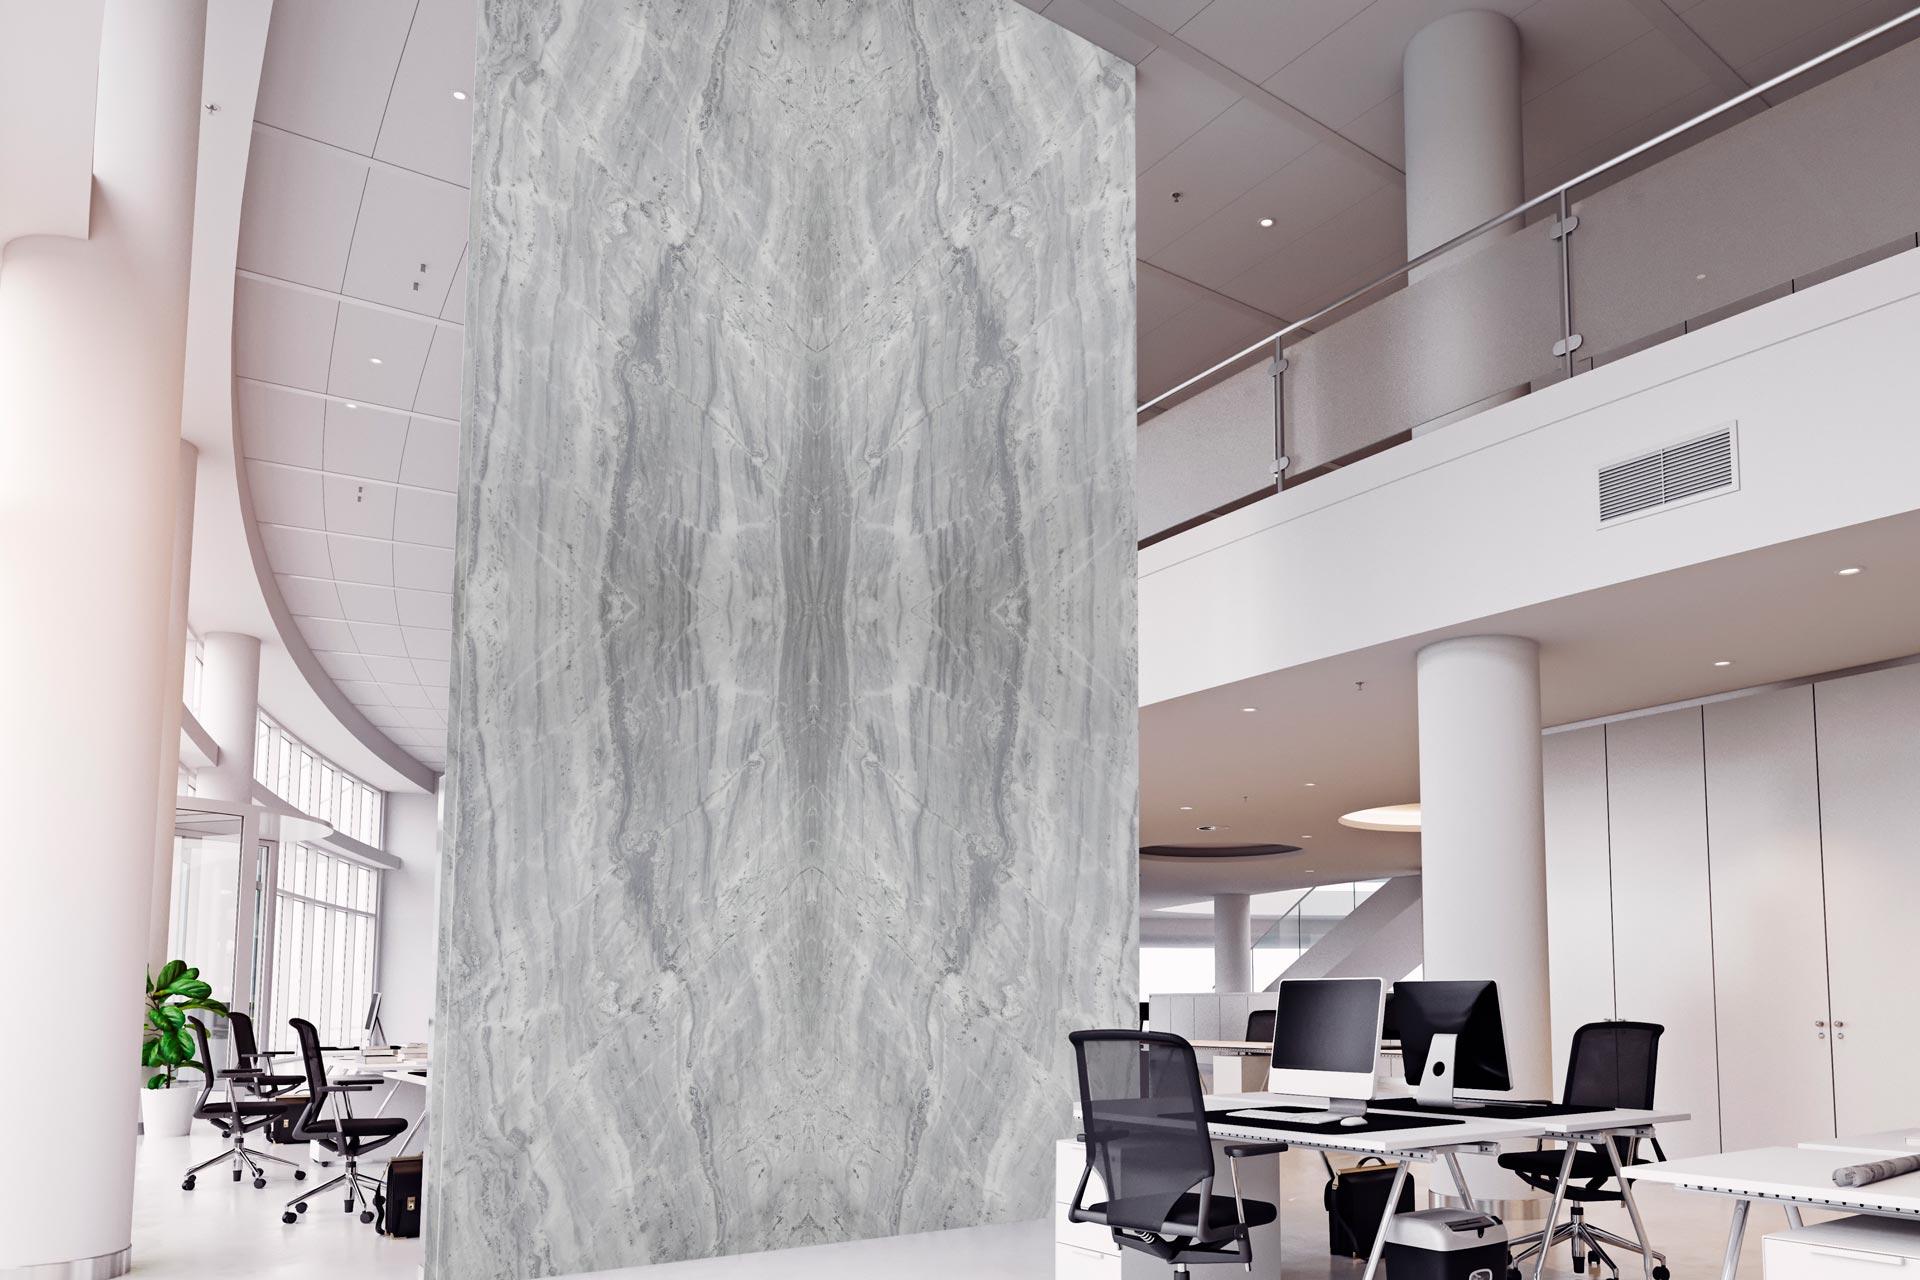 marble tesoro grigio wall